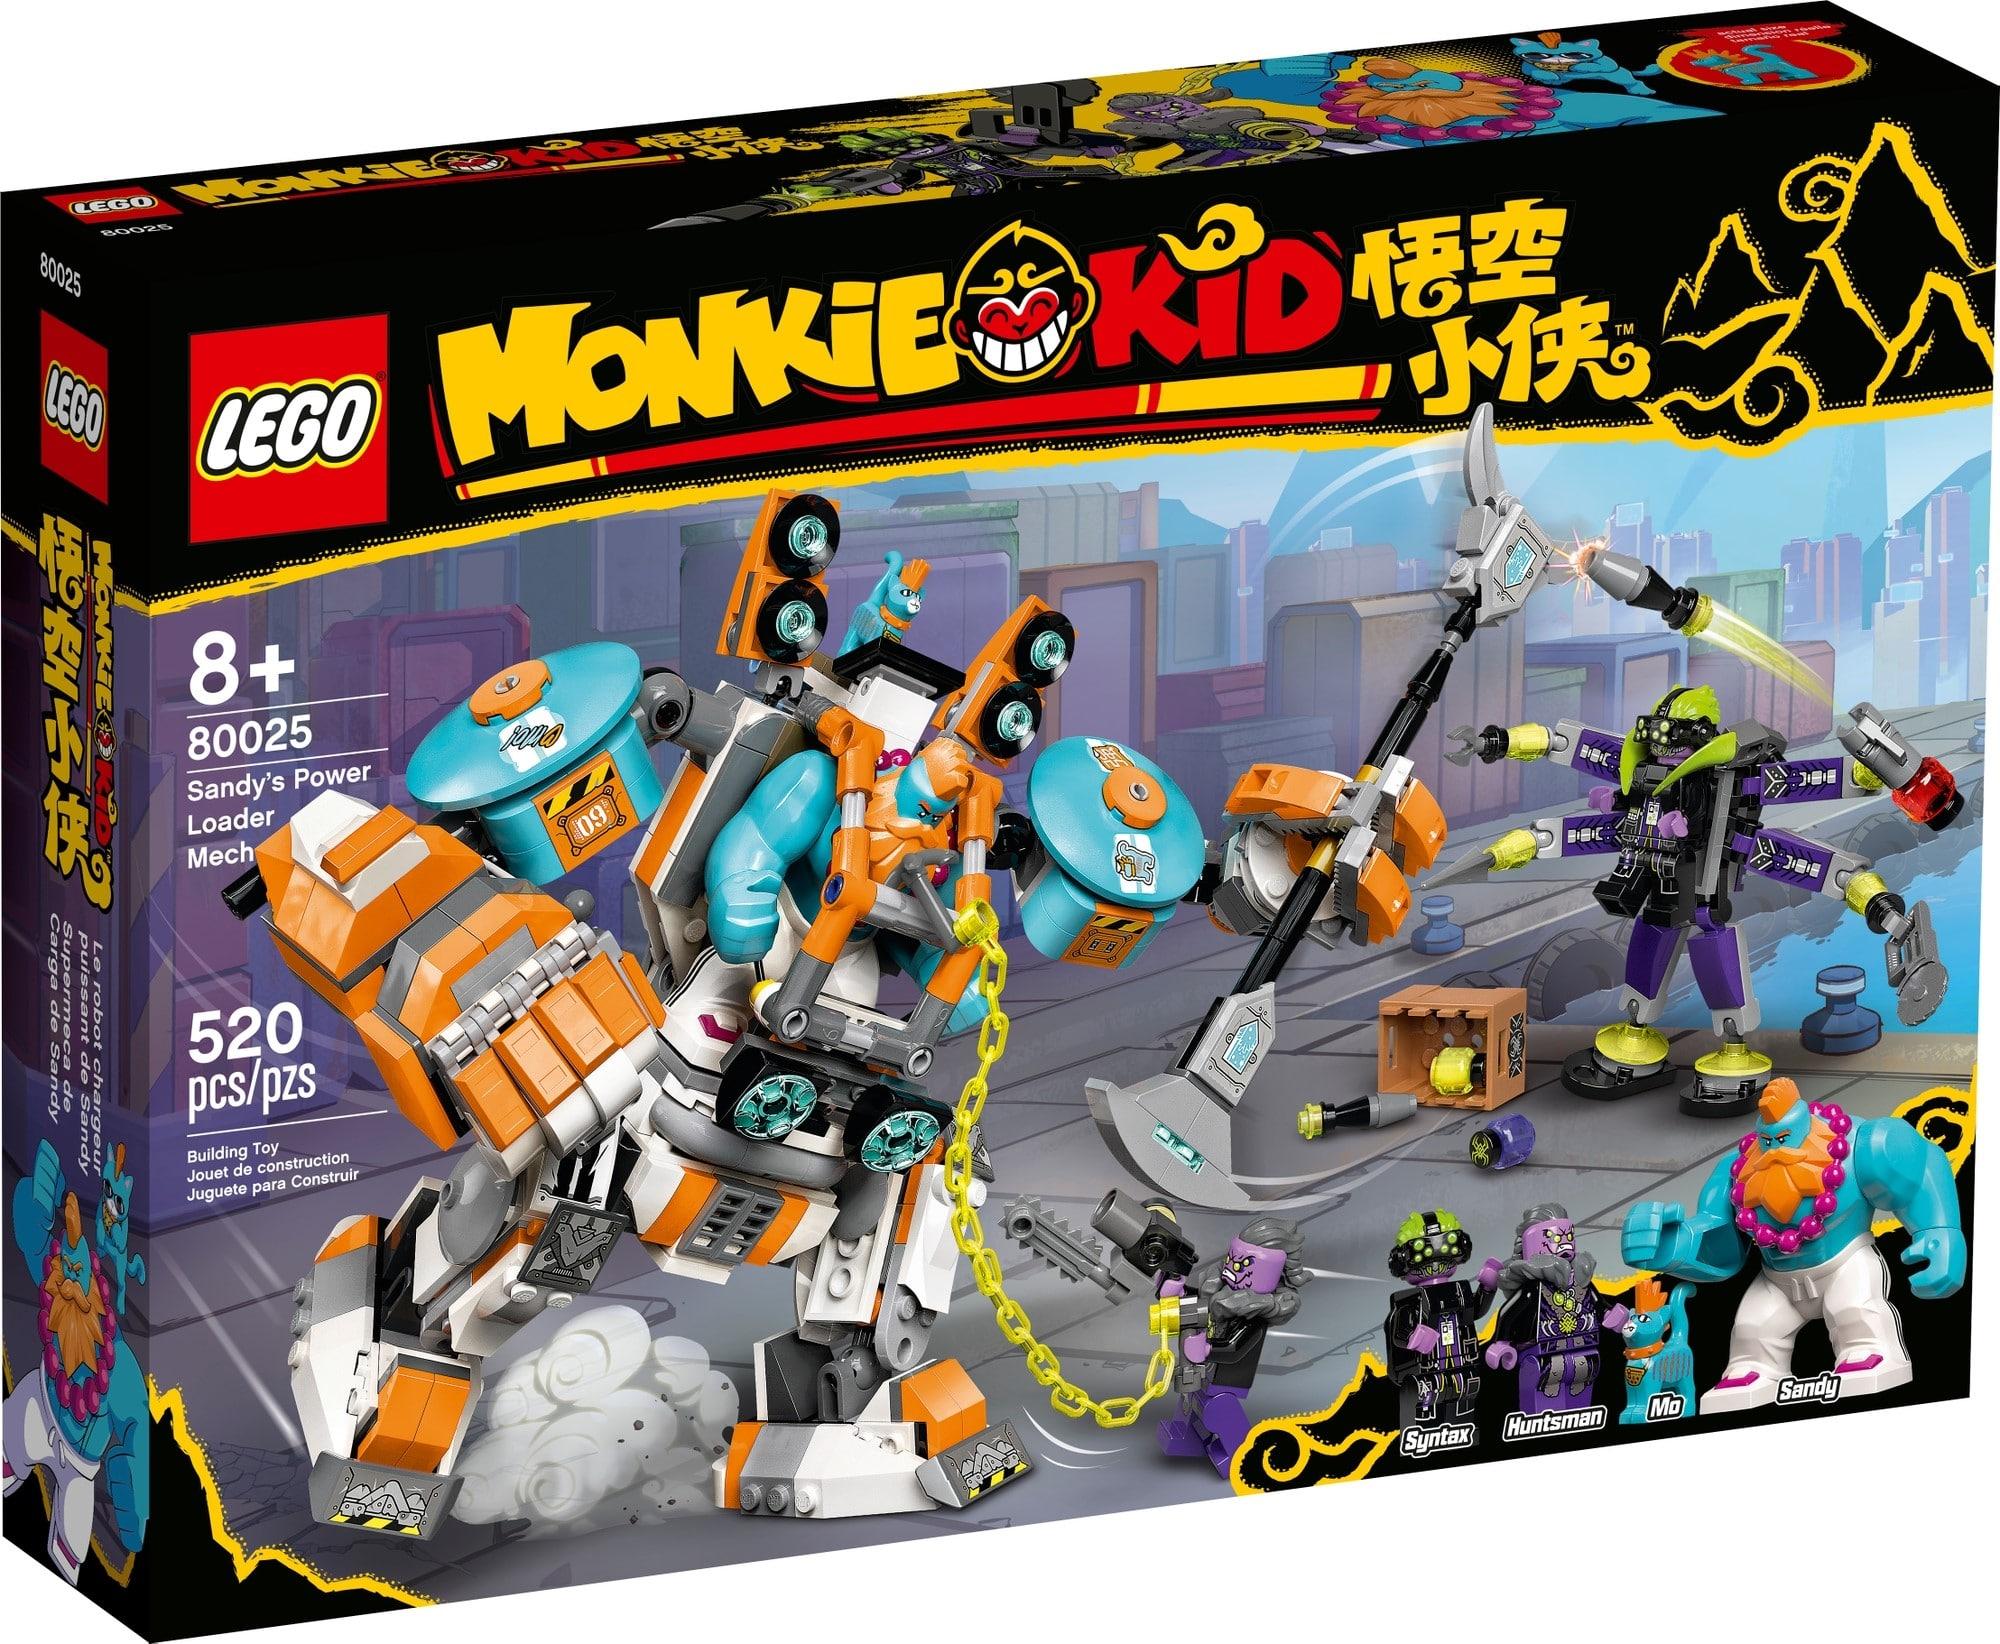 LEGO Monkie Kid 80025 Sandys Power Mech 2